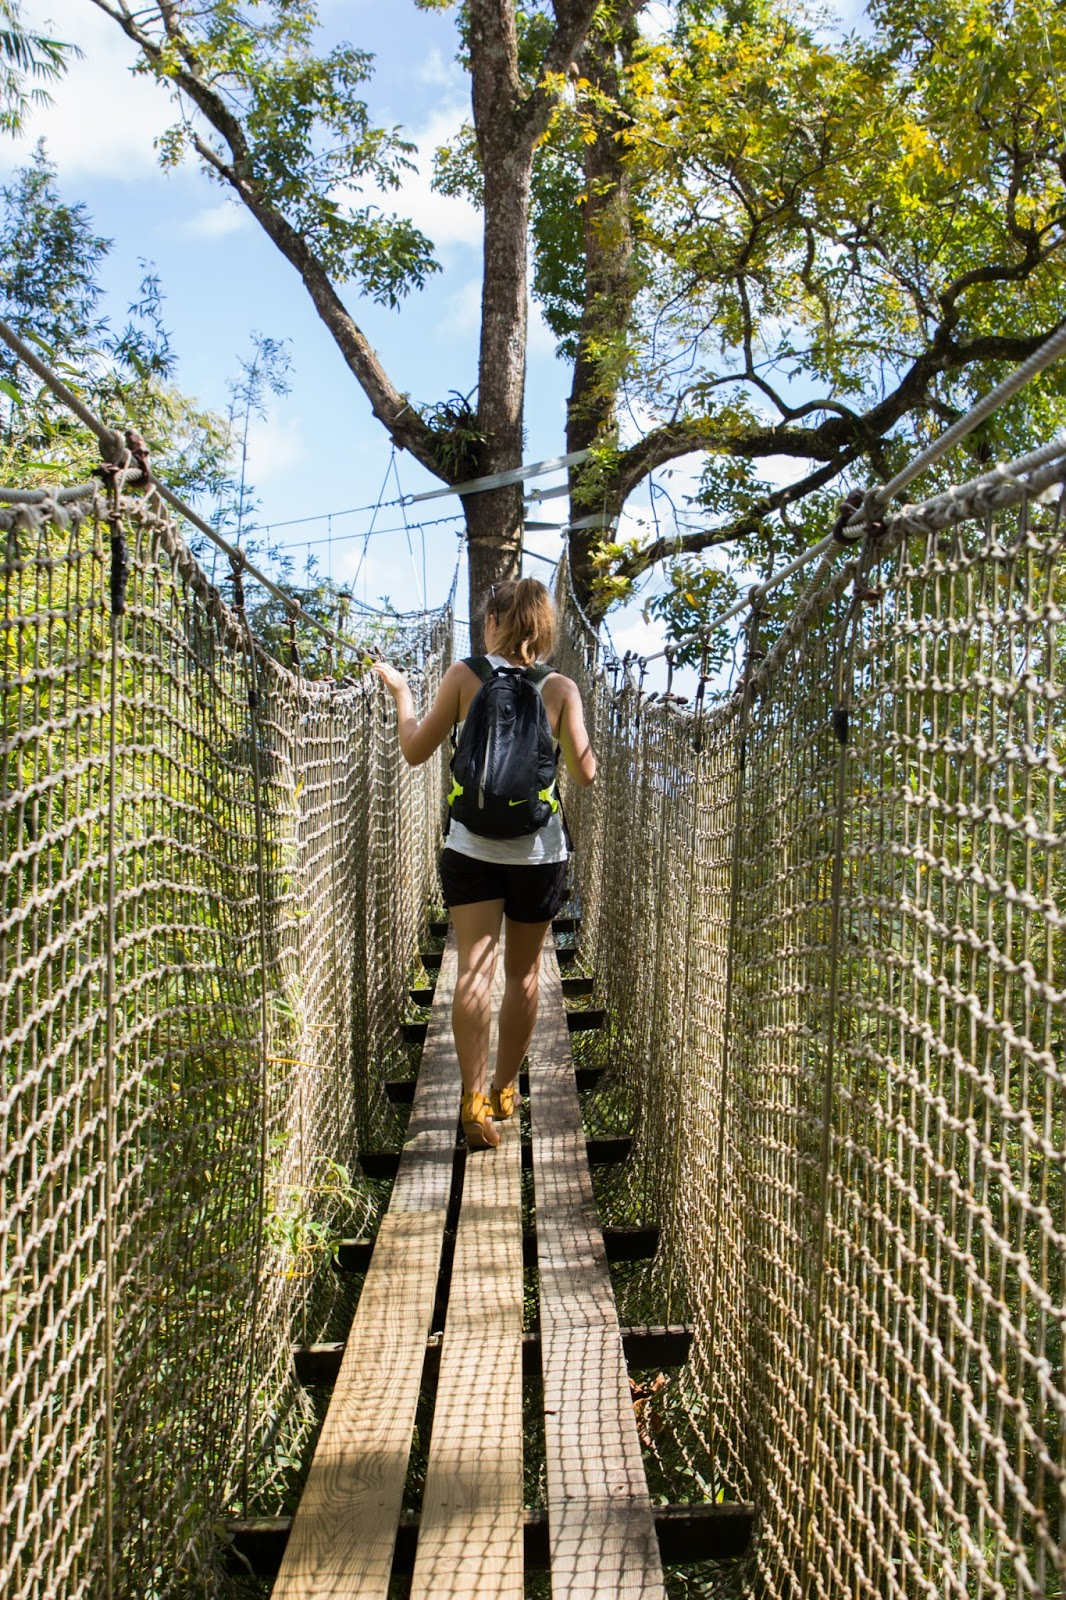 Jardin de Balata pont suspendu